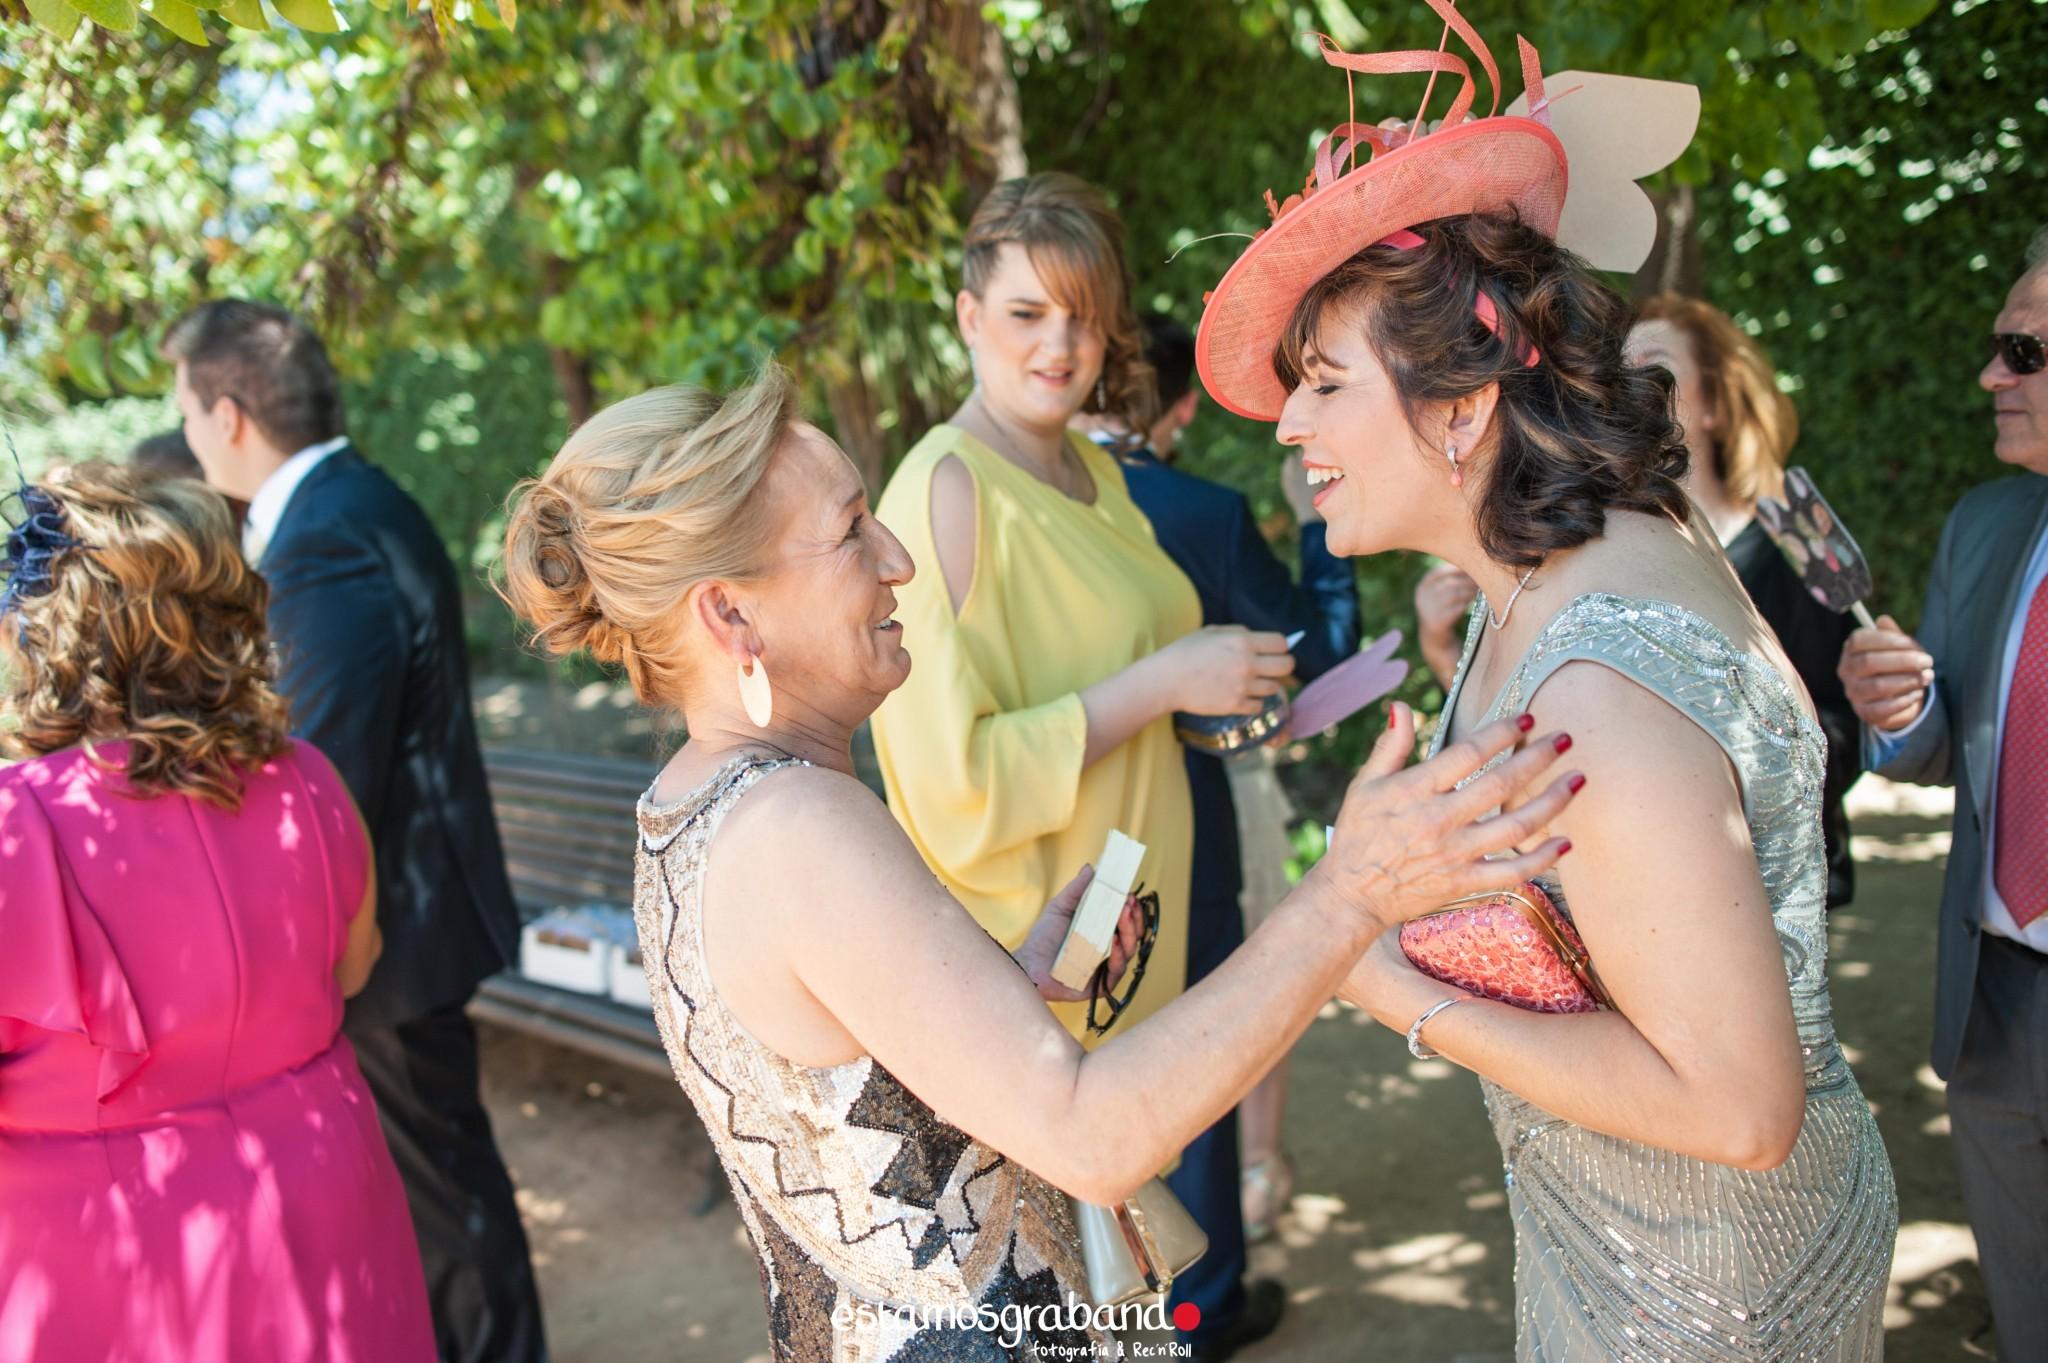 LEO-Y-PEDRO-21 Fotografía de Boda_Leo & Pedro [Jardines de la Mamunia, Granada] - video boda cadiz